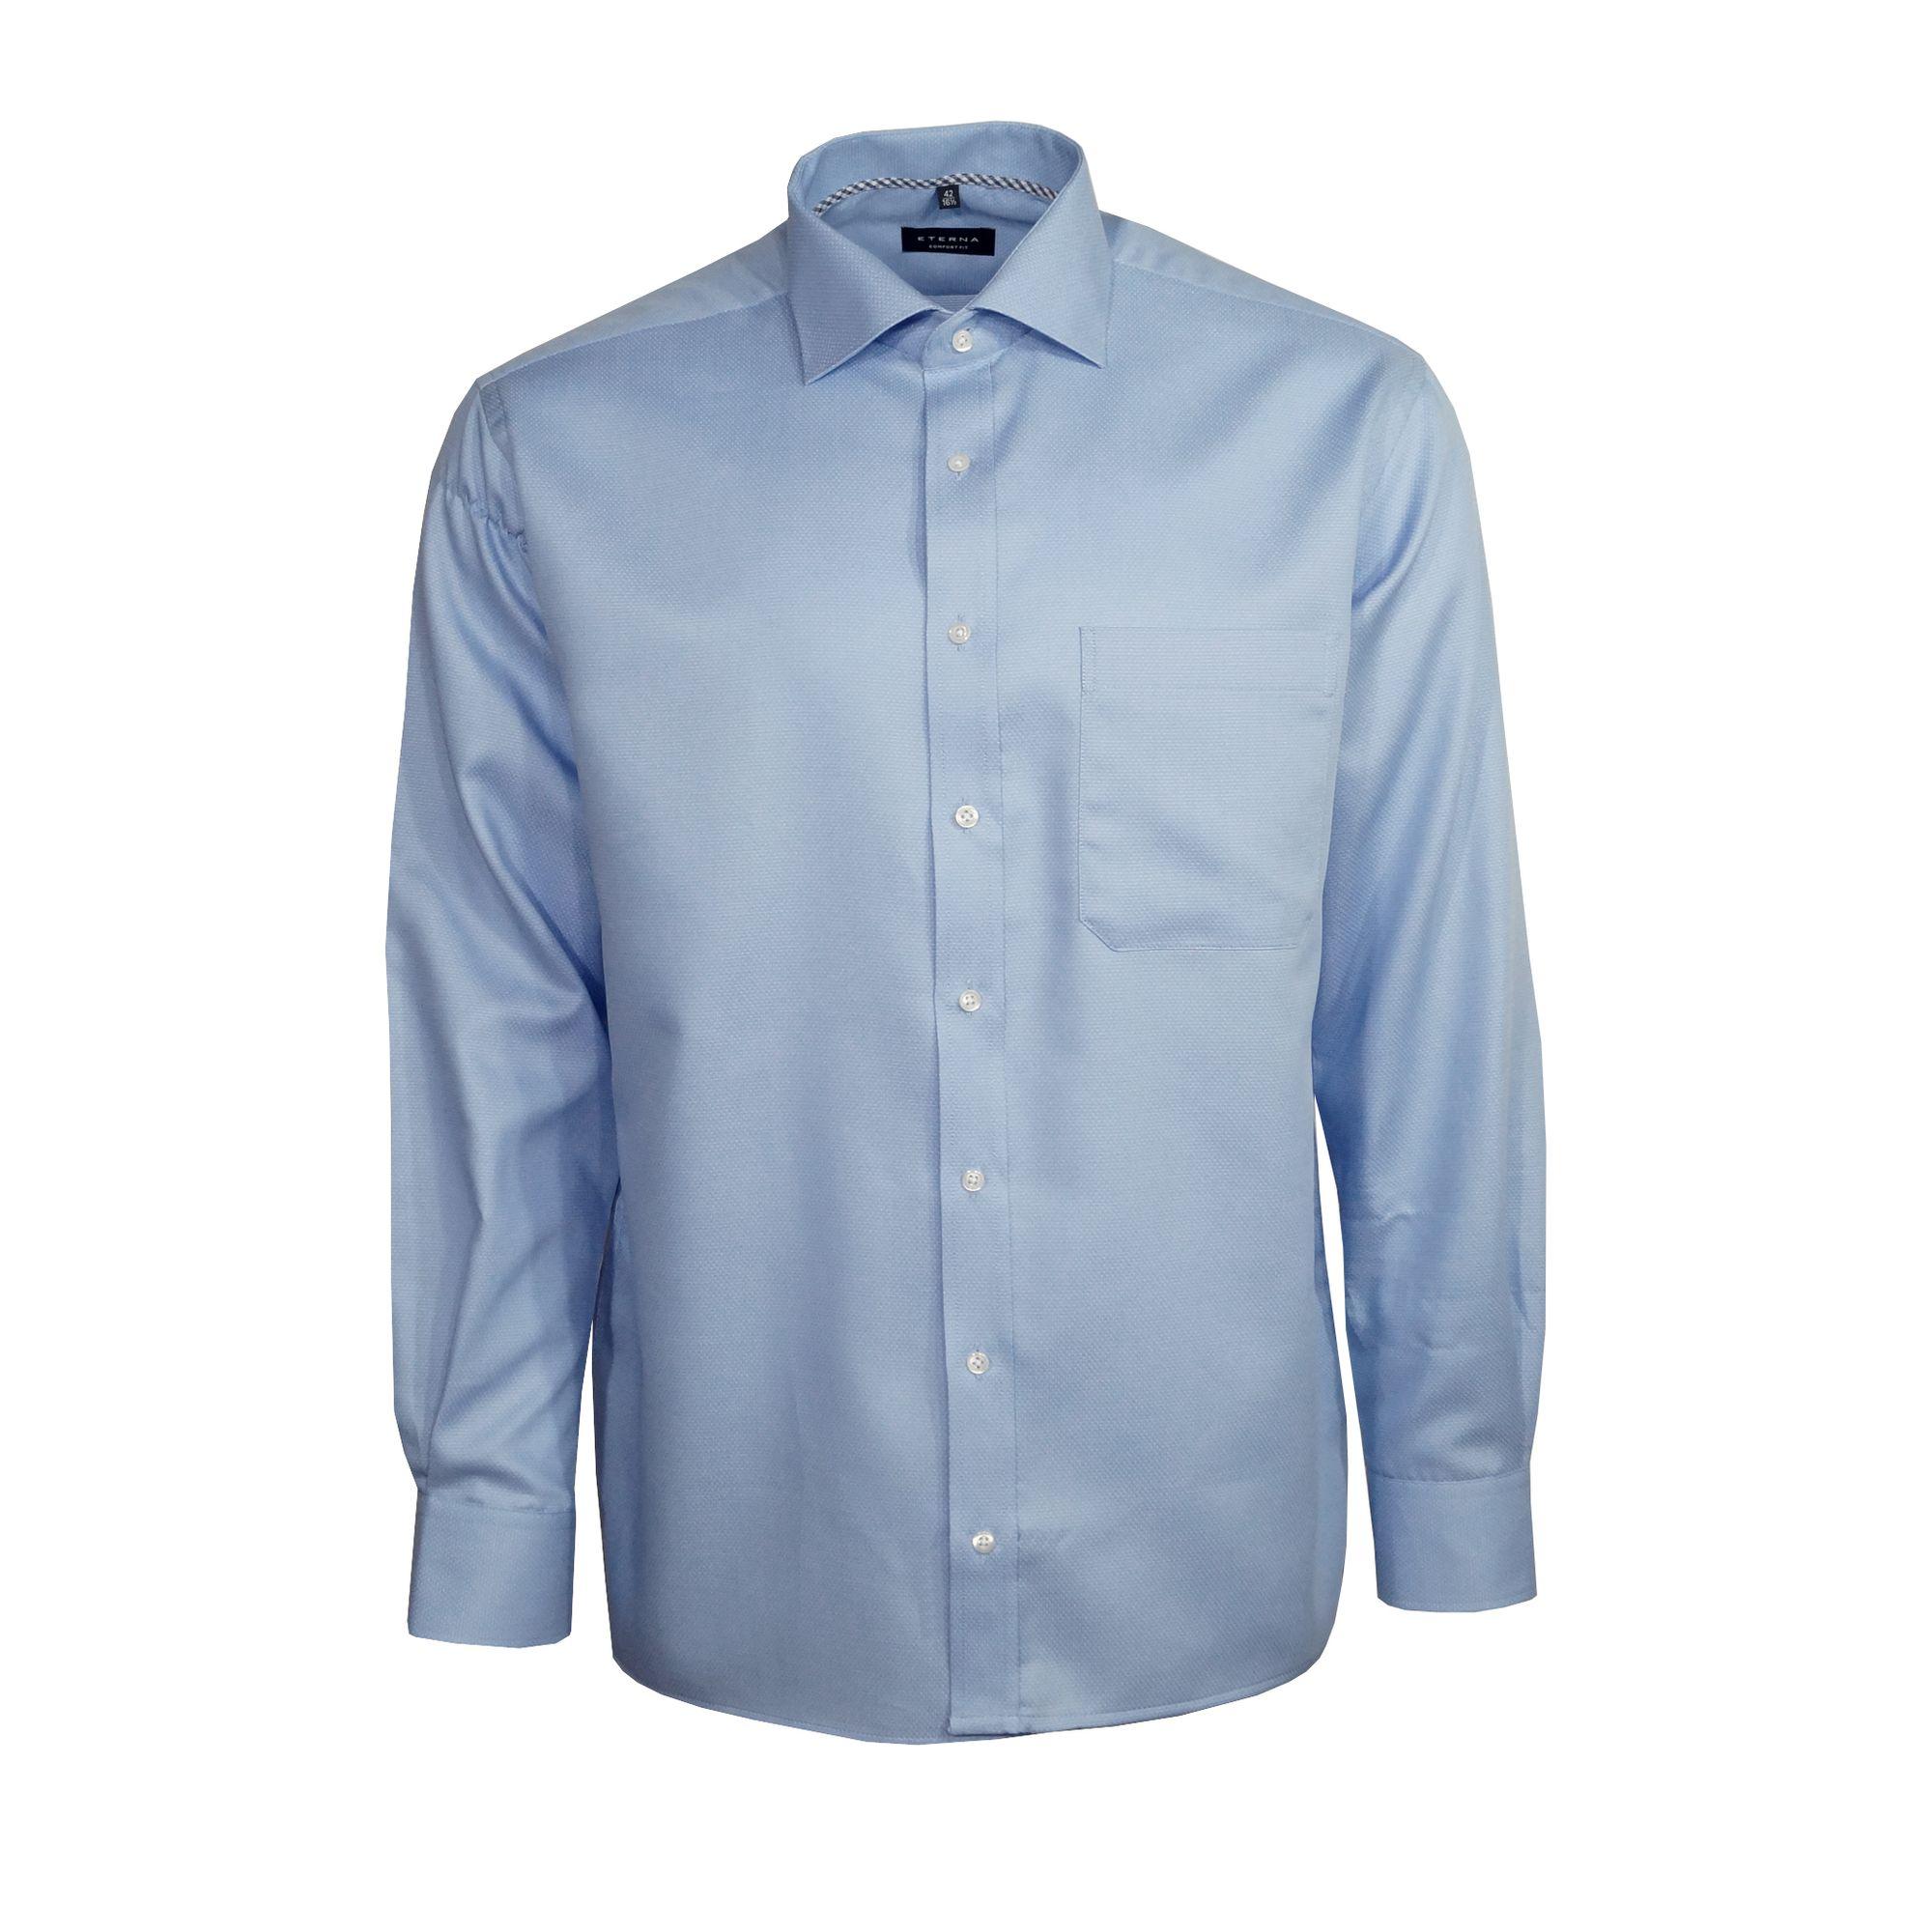 Eterna – Comfort Fit Business Hemd aus Baumwolle – Bordeaux Rot